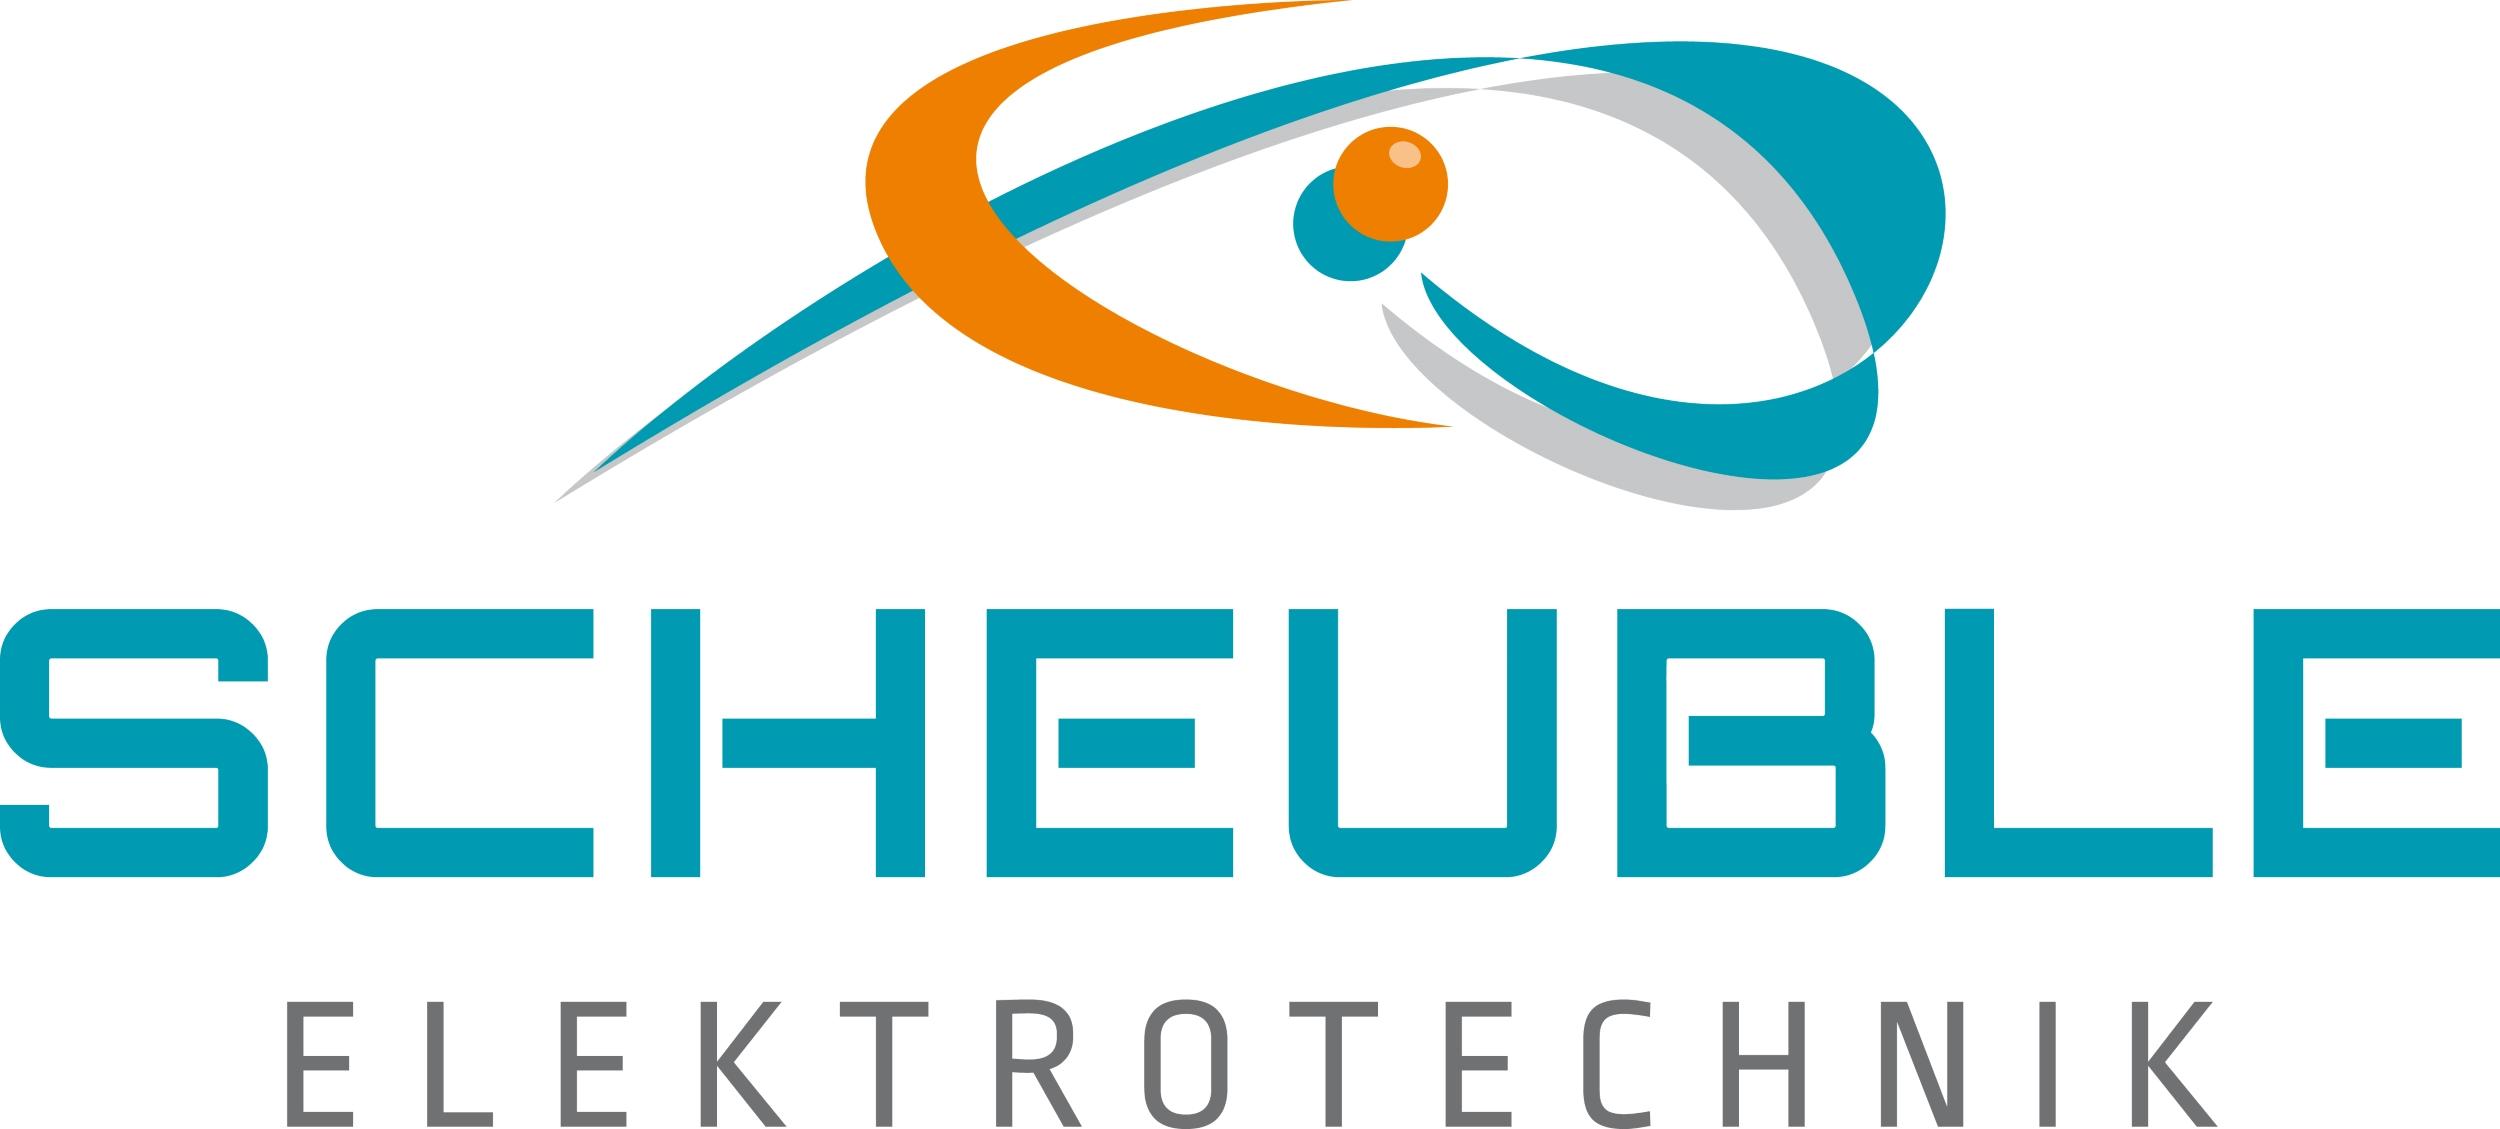 Scheuble Elektrotechnik